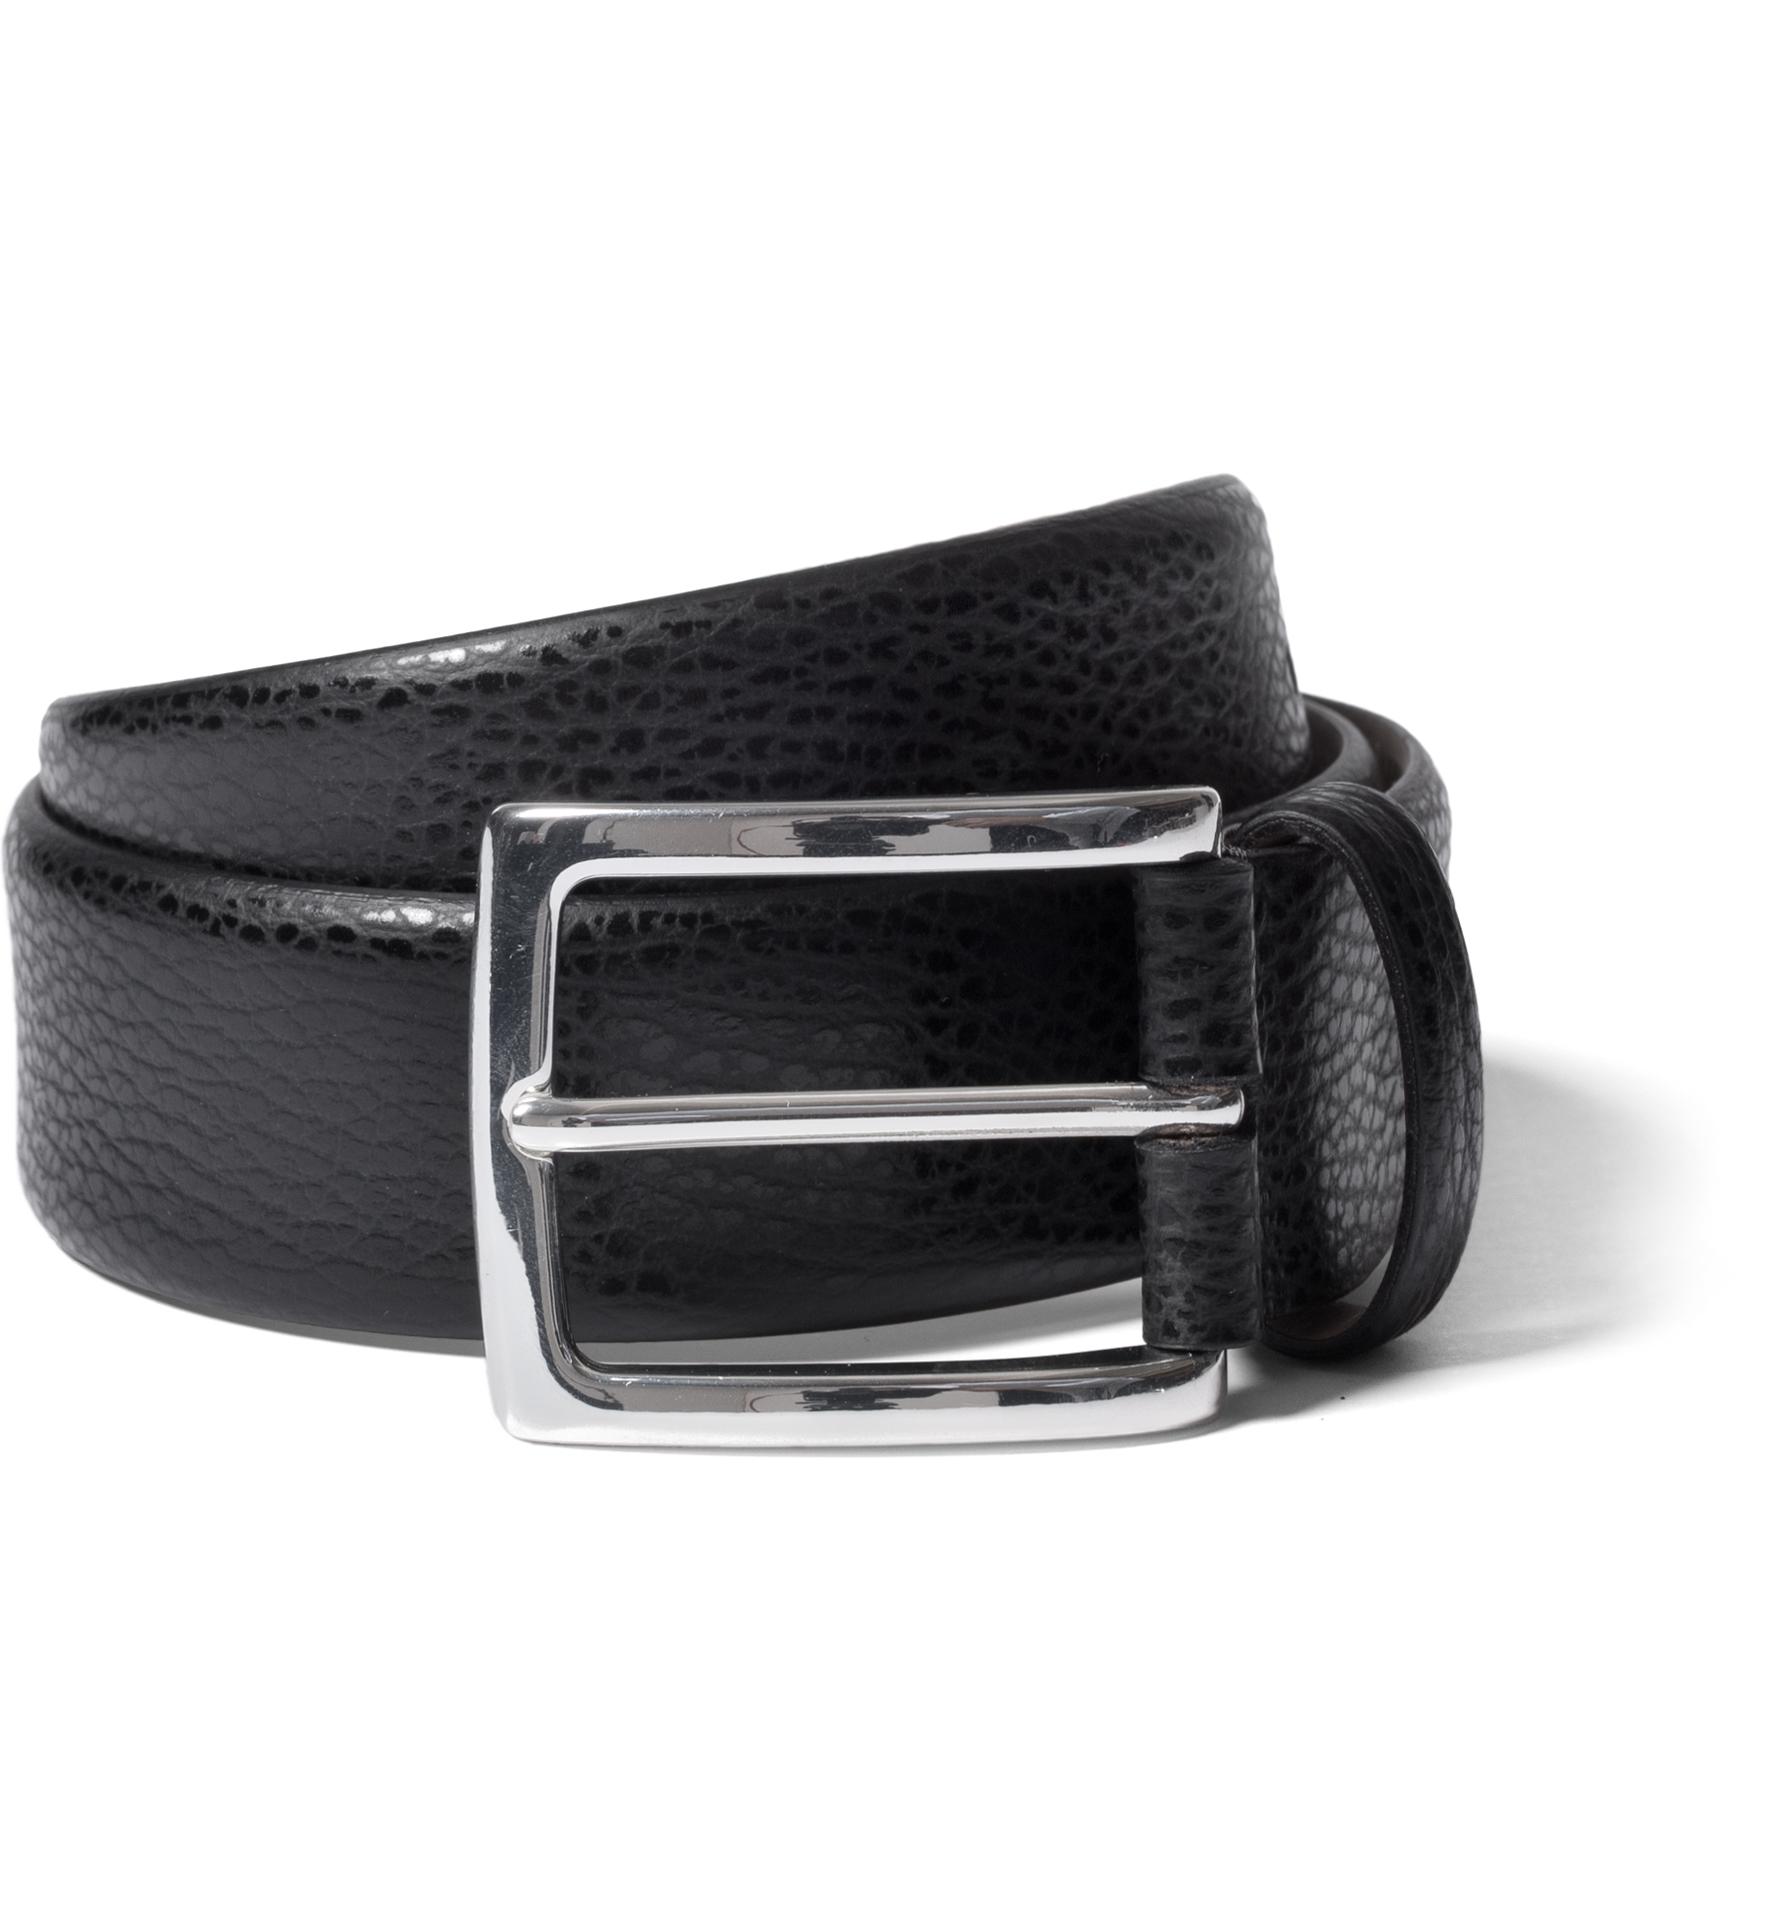 Zoom Image of Black Pebble Grain Leather Belt